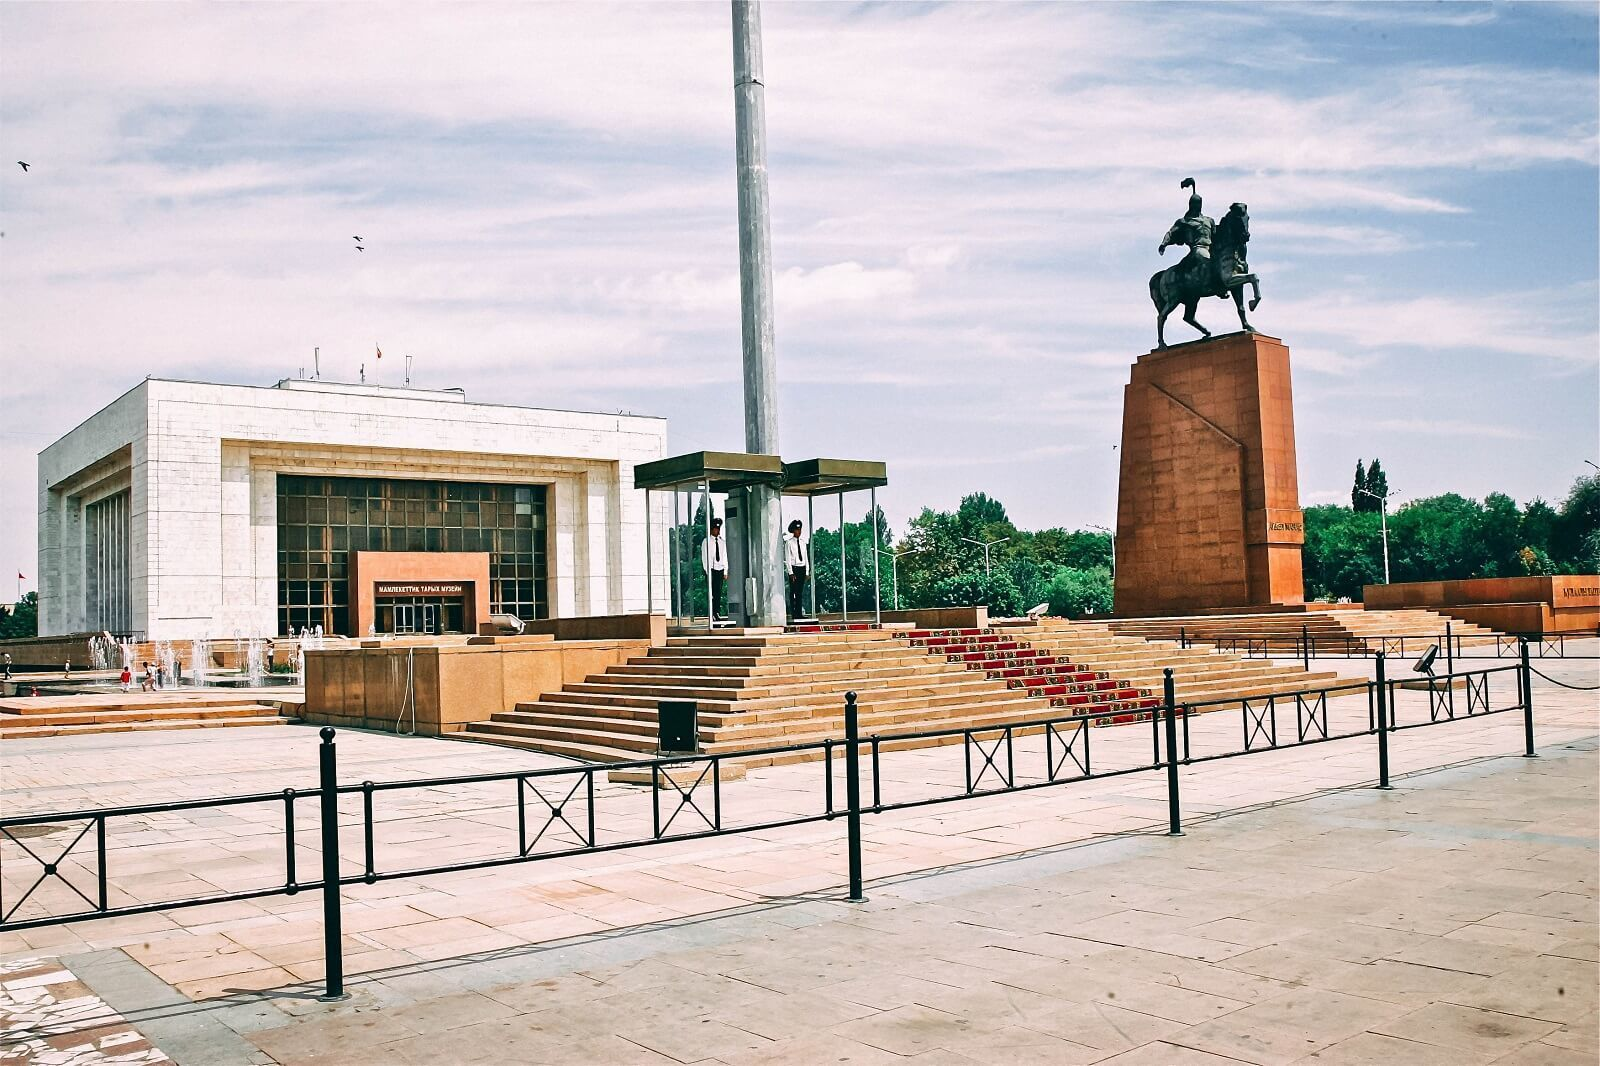 Bishkek City Tour & Ala Archa National Park